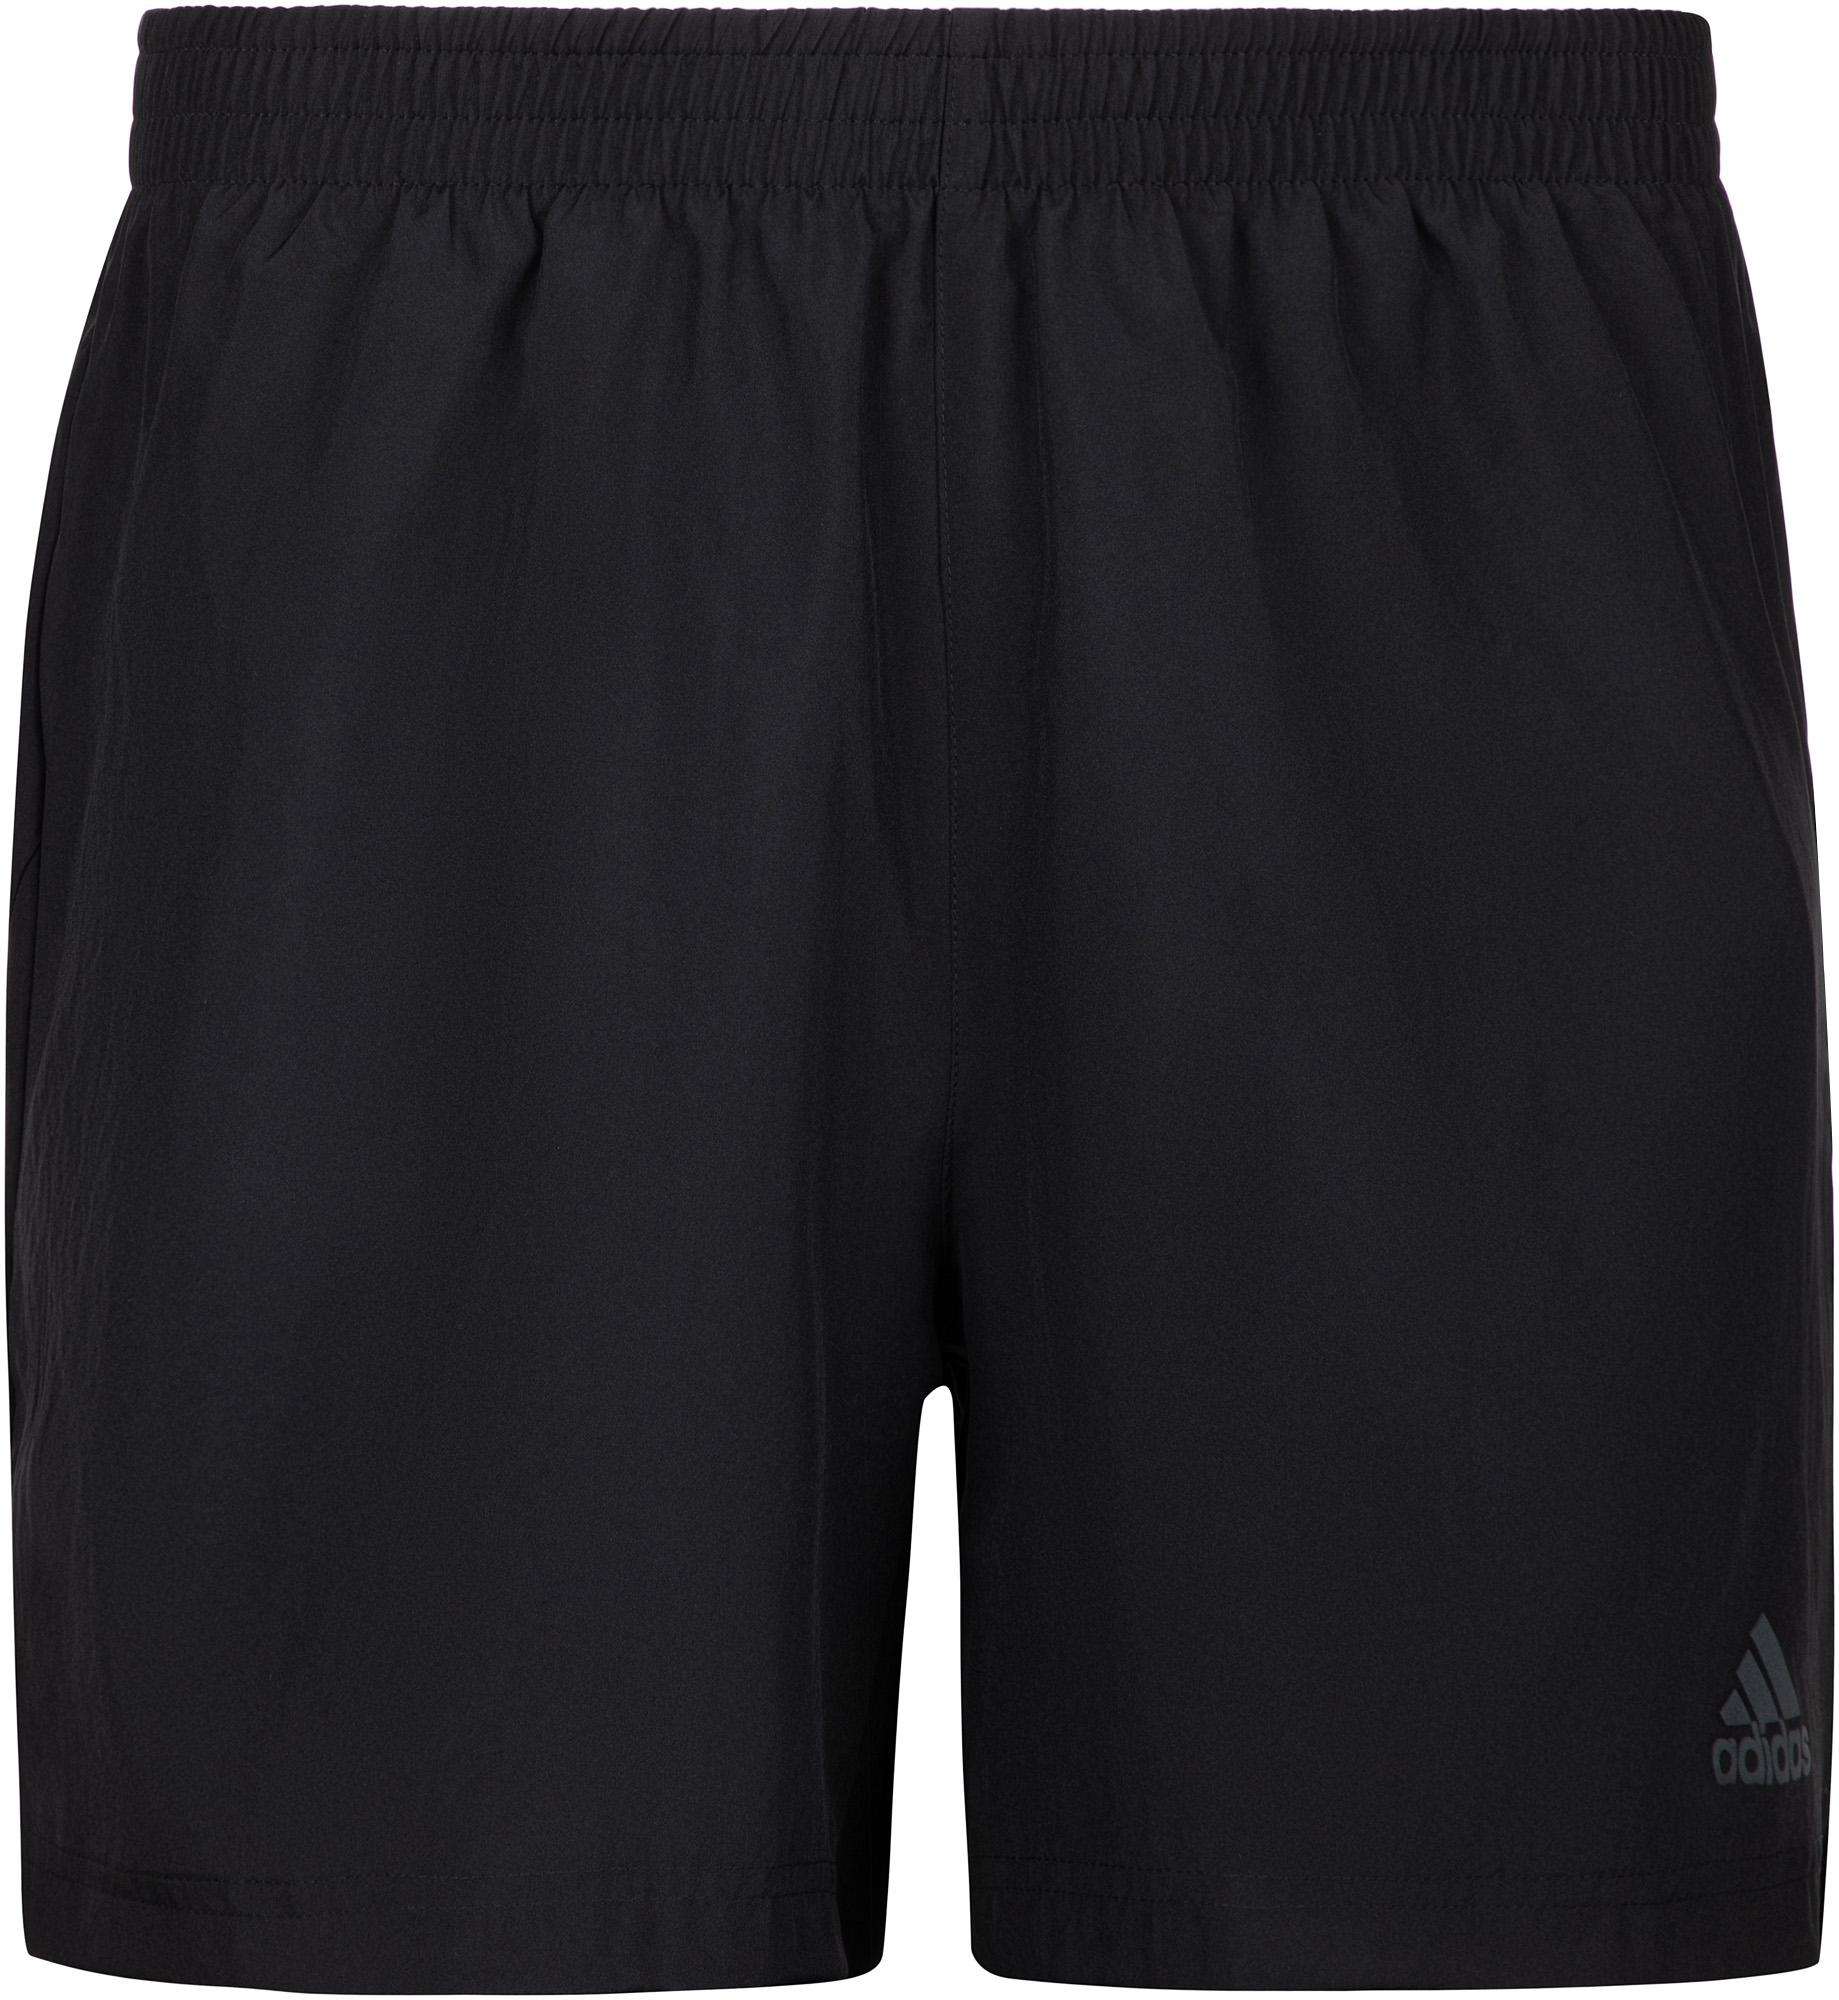 Adidas Шорты мужские adidas Run It 3-Stripes, размер 52-54 шорты для тенниса мужские adidas uncontrol climachill цвет черный b45842 размер l 52 54